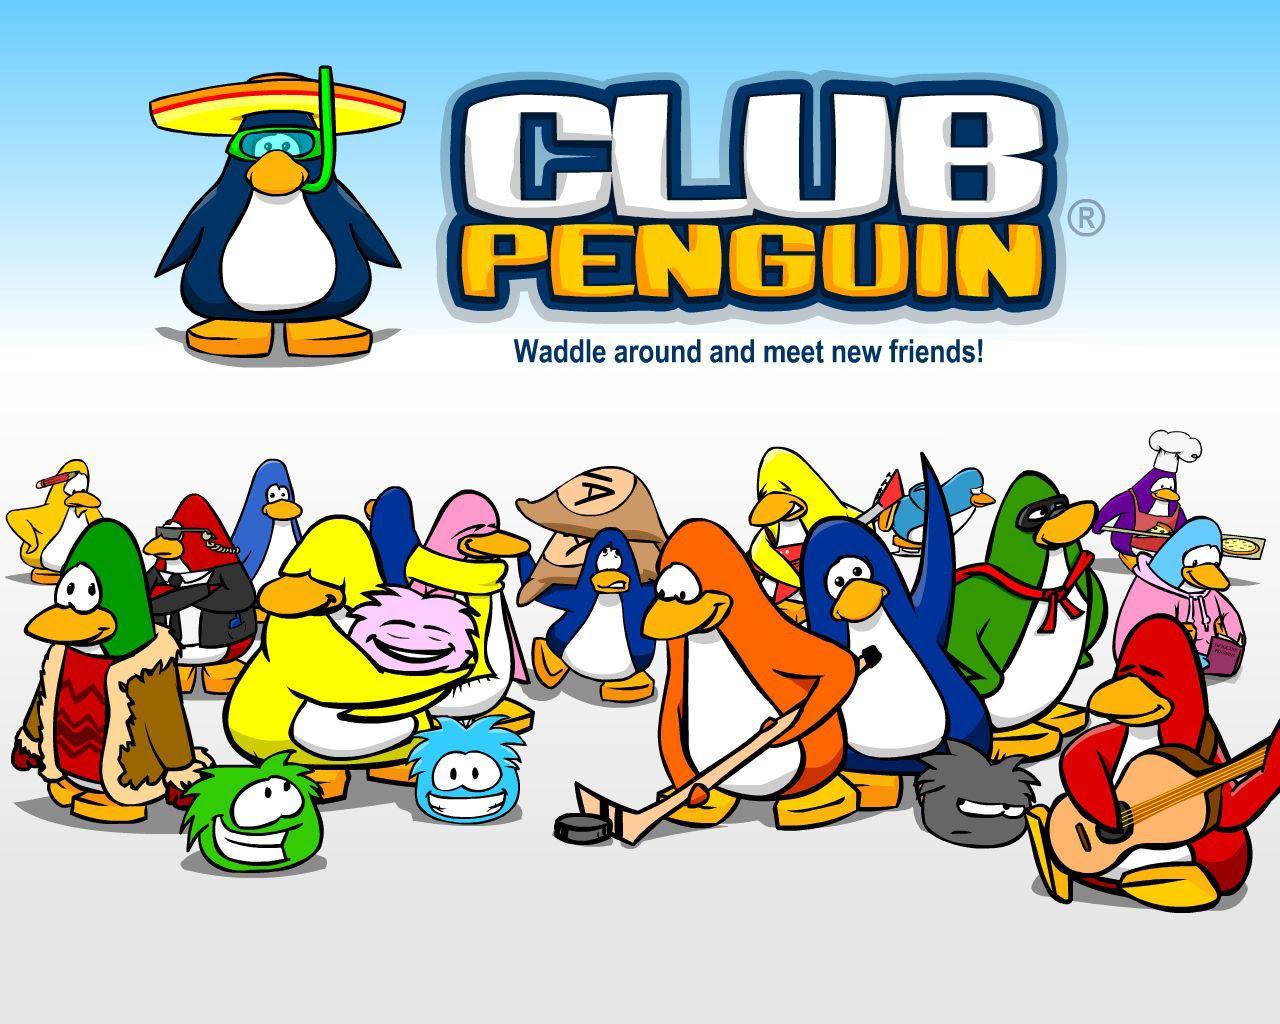 http://2.bp.blogspot.com/_VD_JLrNXjjM/TEhHIFhbaiI/AAAAAAAAACY/7h7eRUhoNuE/s1600/club-penguin.jpg